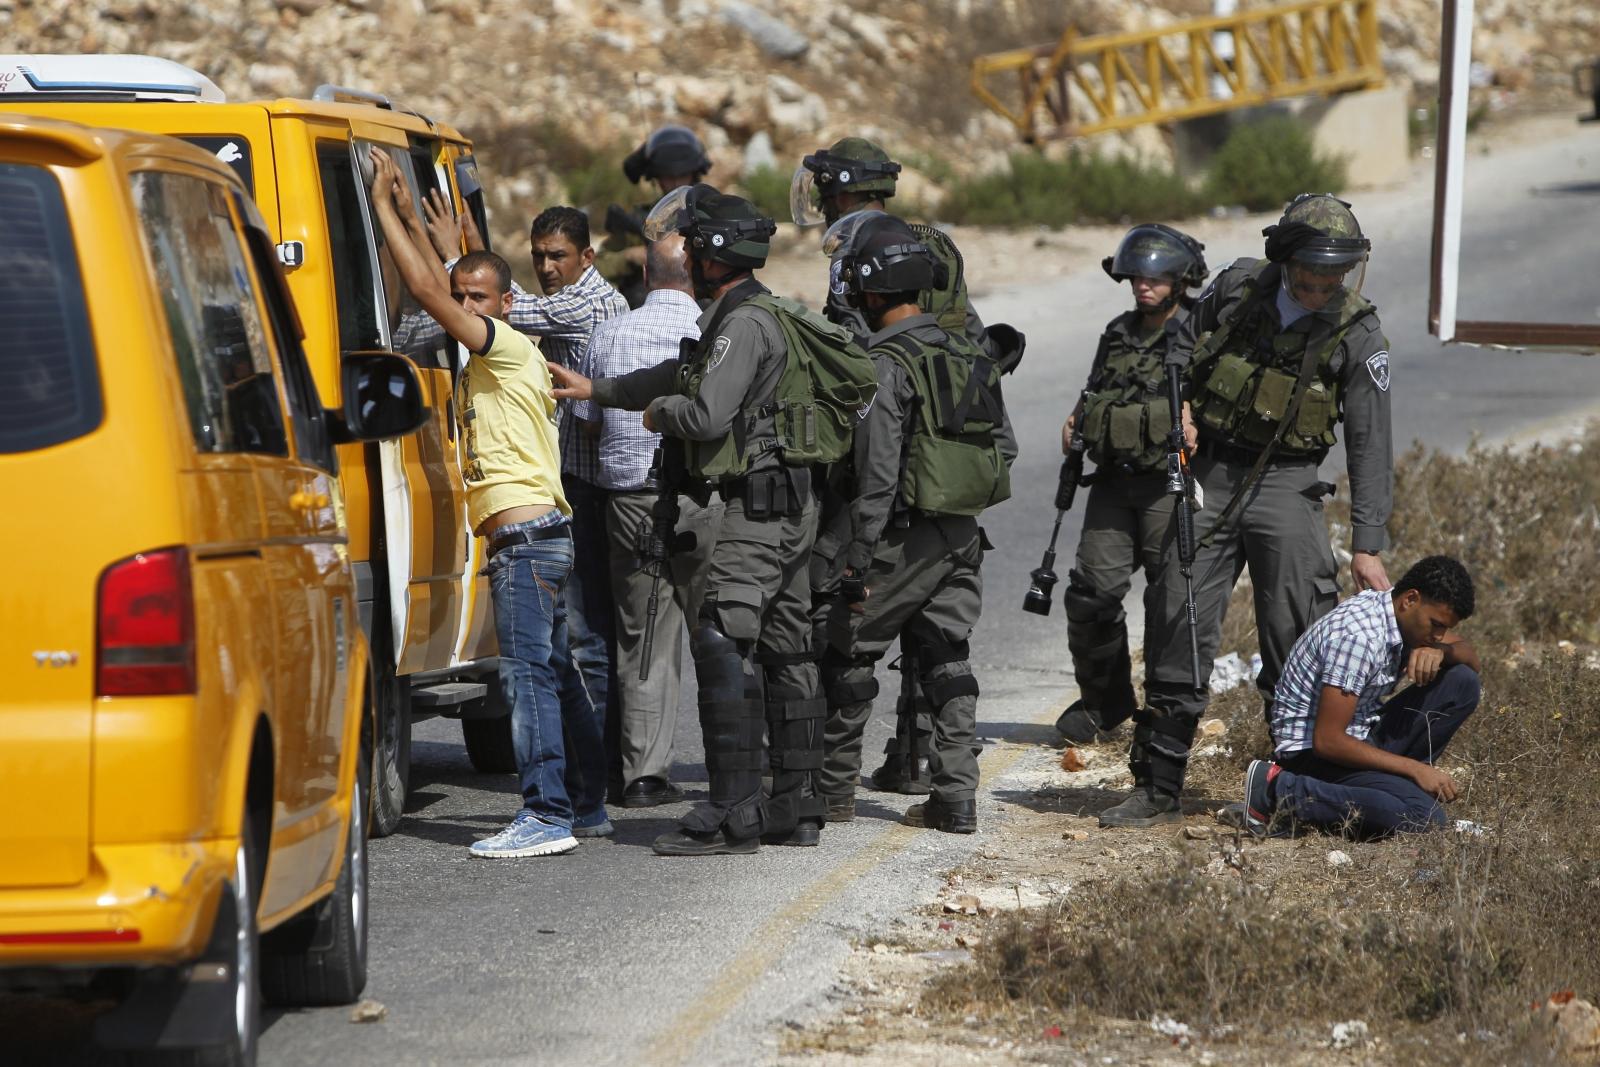 West Bank Israel Unit 8200 Palestine